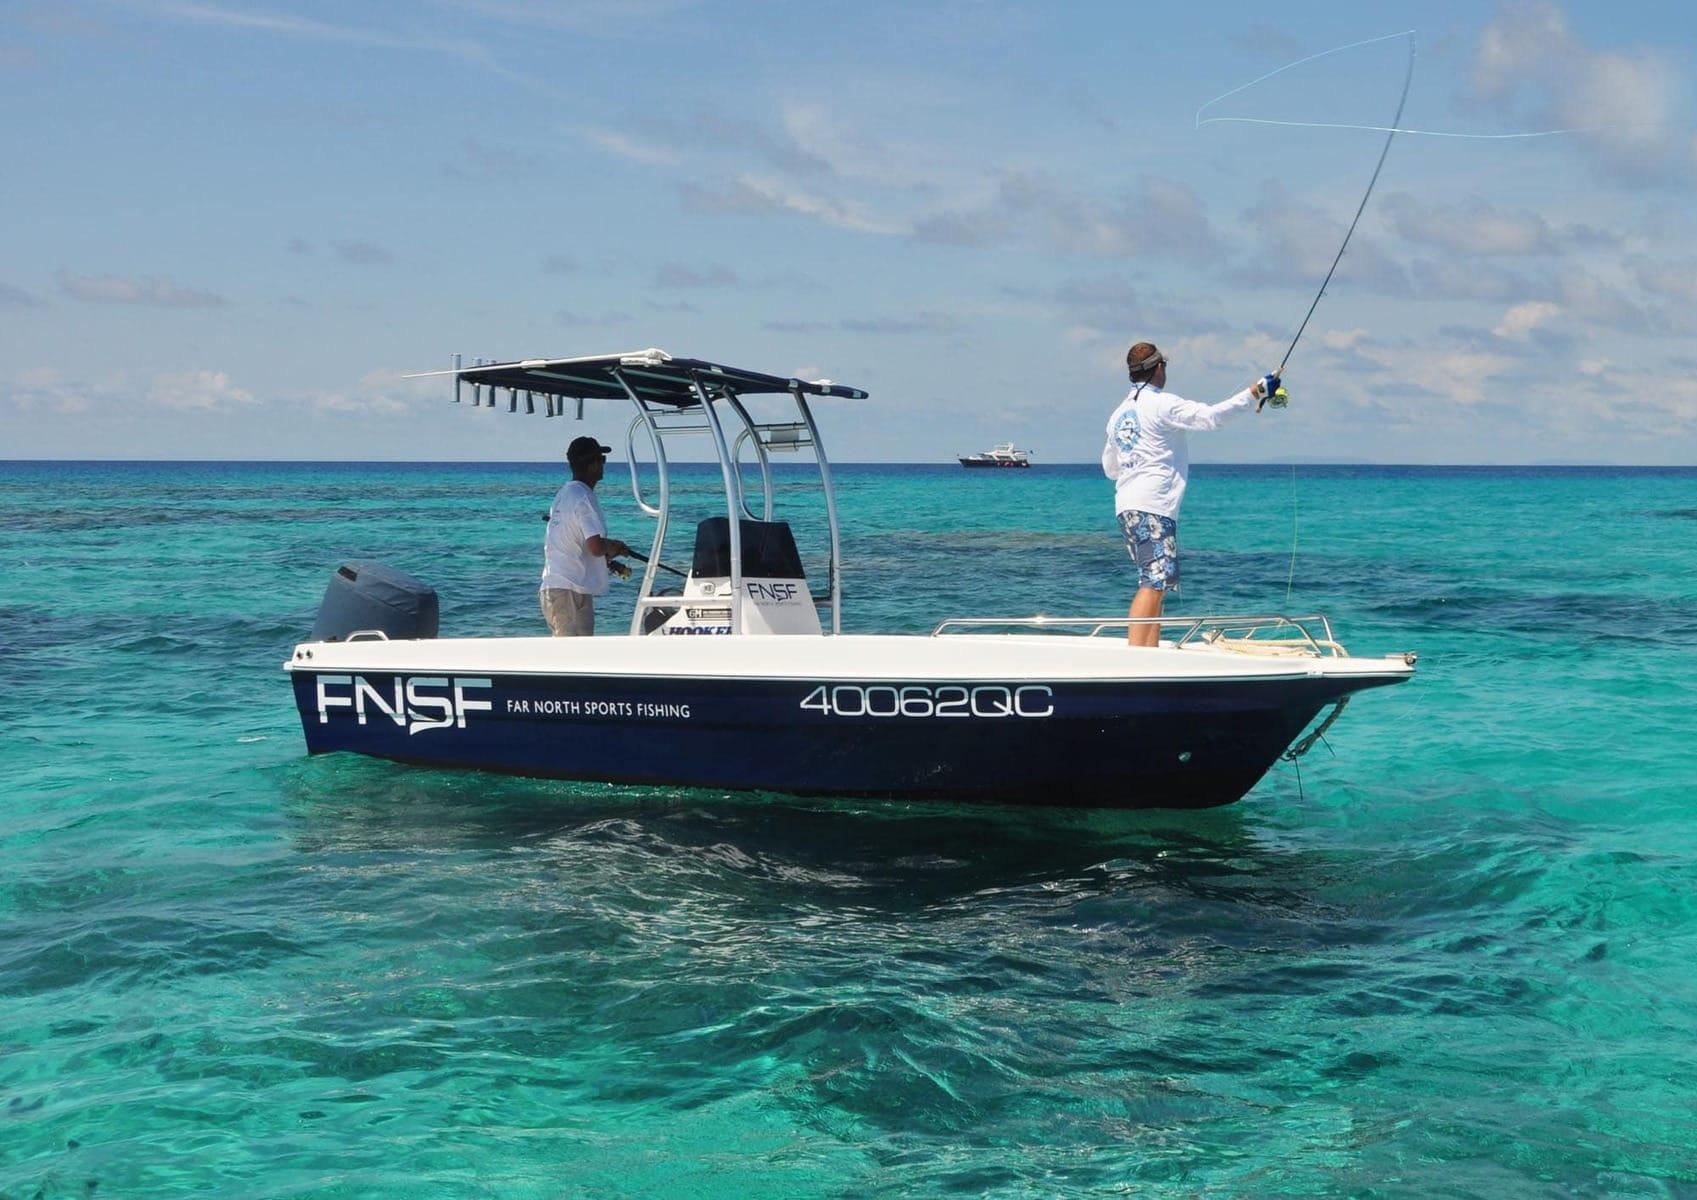 fishing tours port douglas Barramundi, Mangrove Jack, Finger Mark, Coral Trout, Nannygai, Red Emporia, Mackerel, Tuna and Giant Trevally